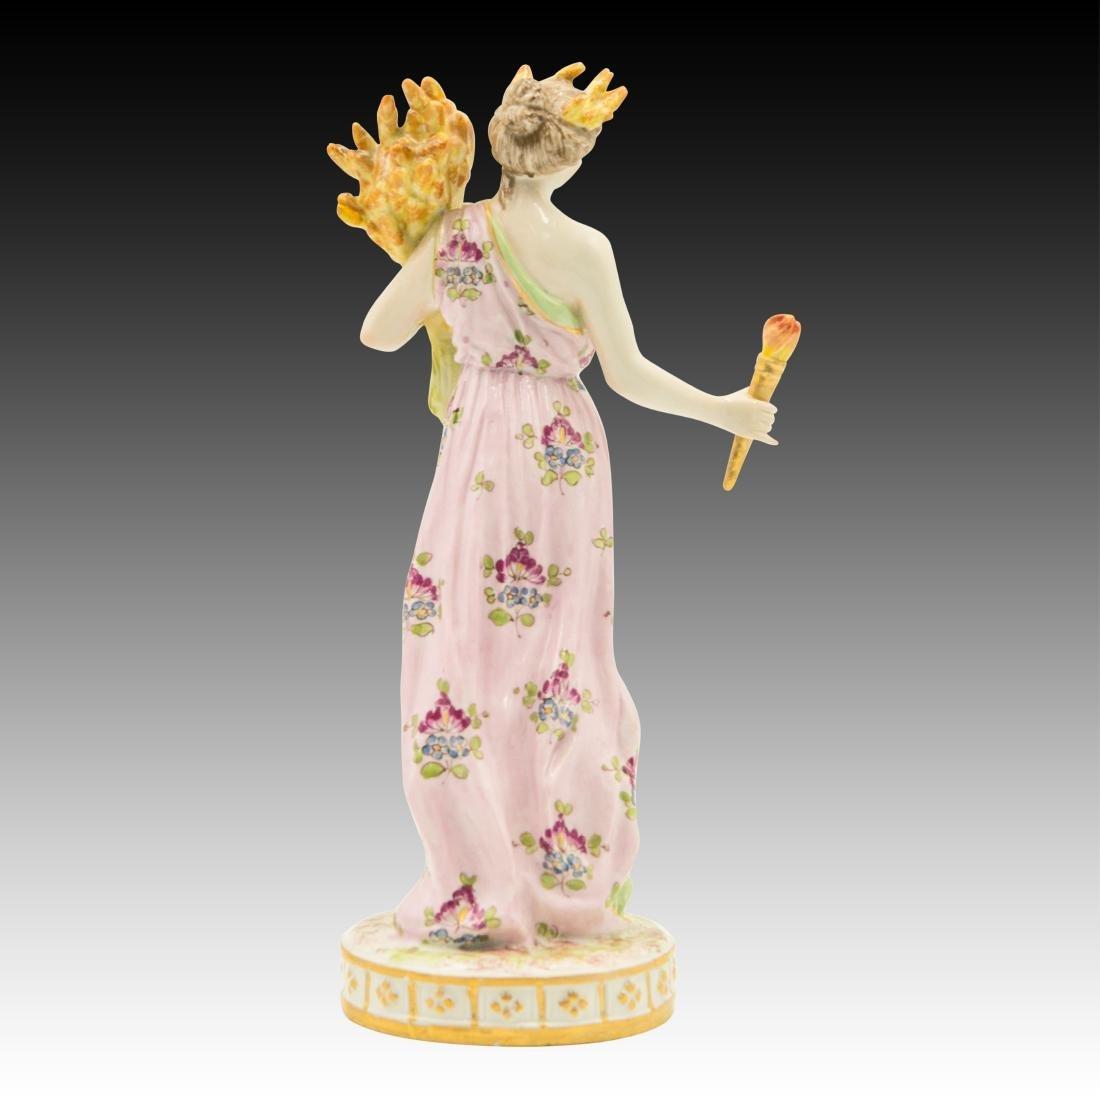 Meissen semi-nude Woman With Wheat Figurine - 3